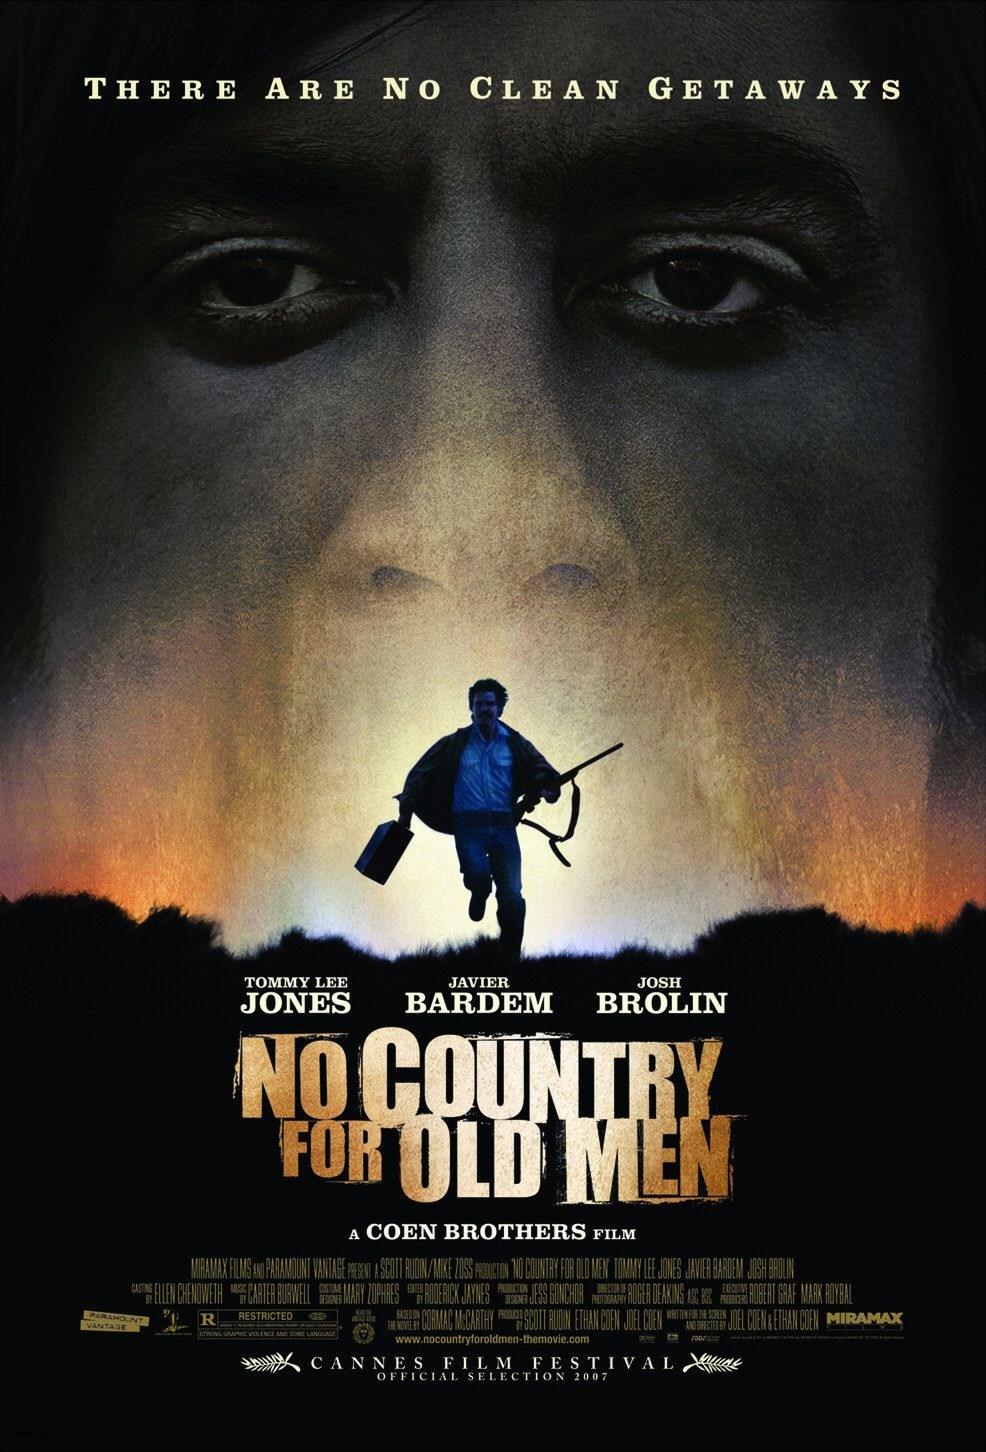 No country for old men onde os fracos no tem vez crtica non nocountryforoldmeng fandeluxe Gallery